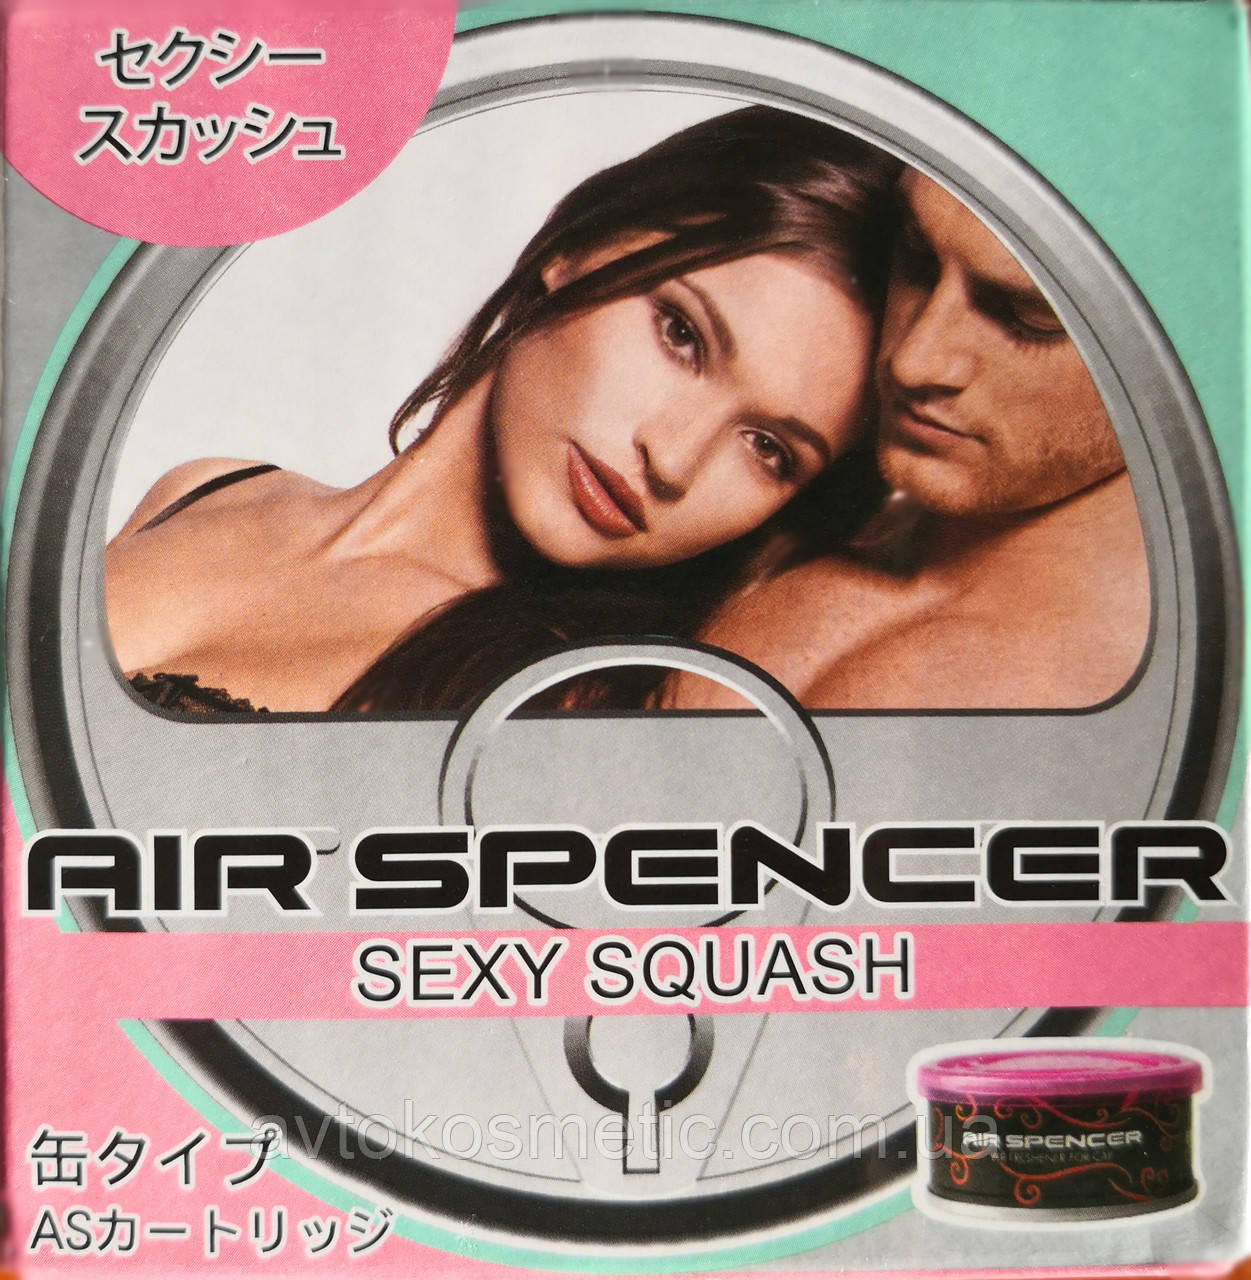 Ароматизатор Eikosha меловой Sexy Squash